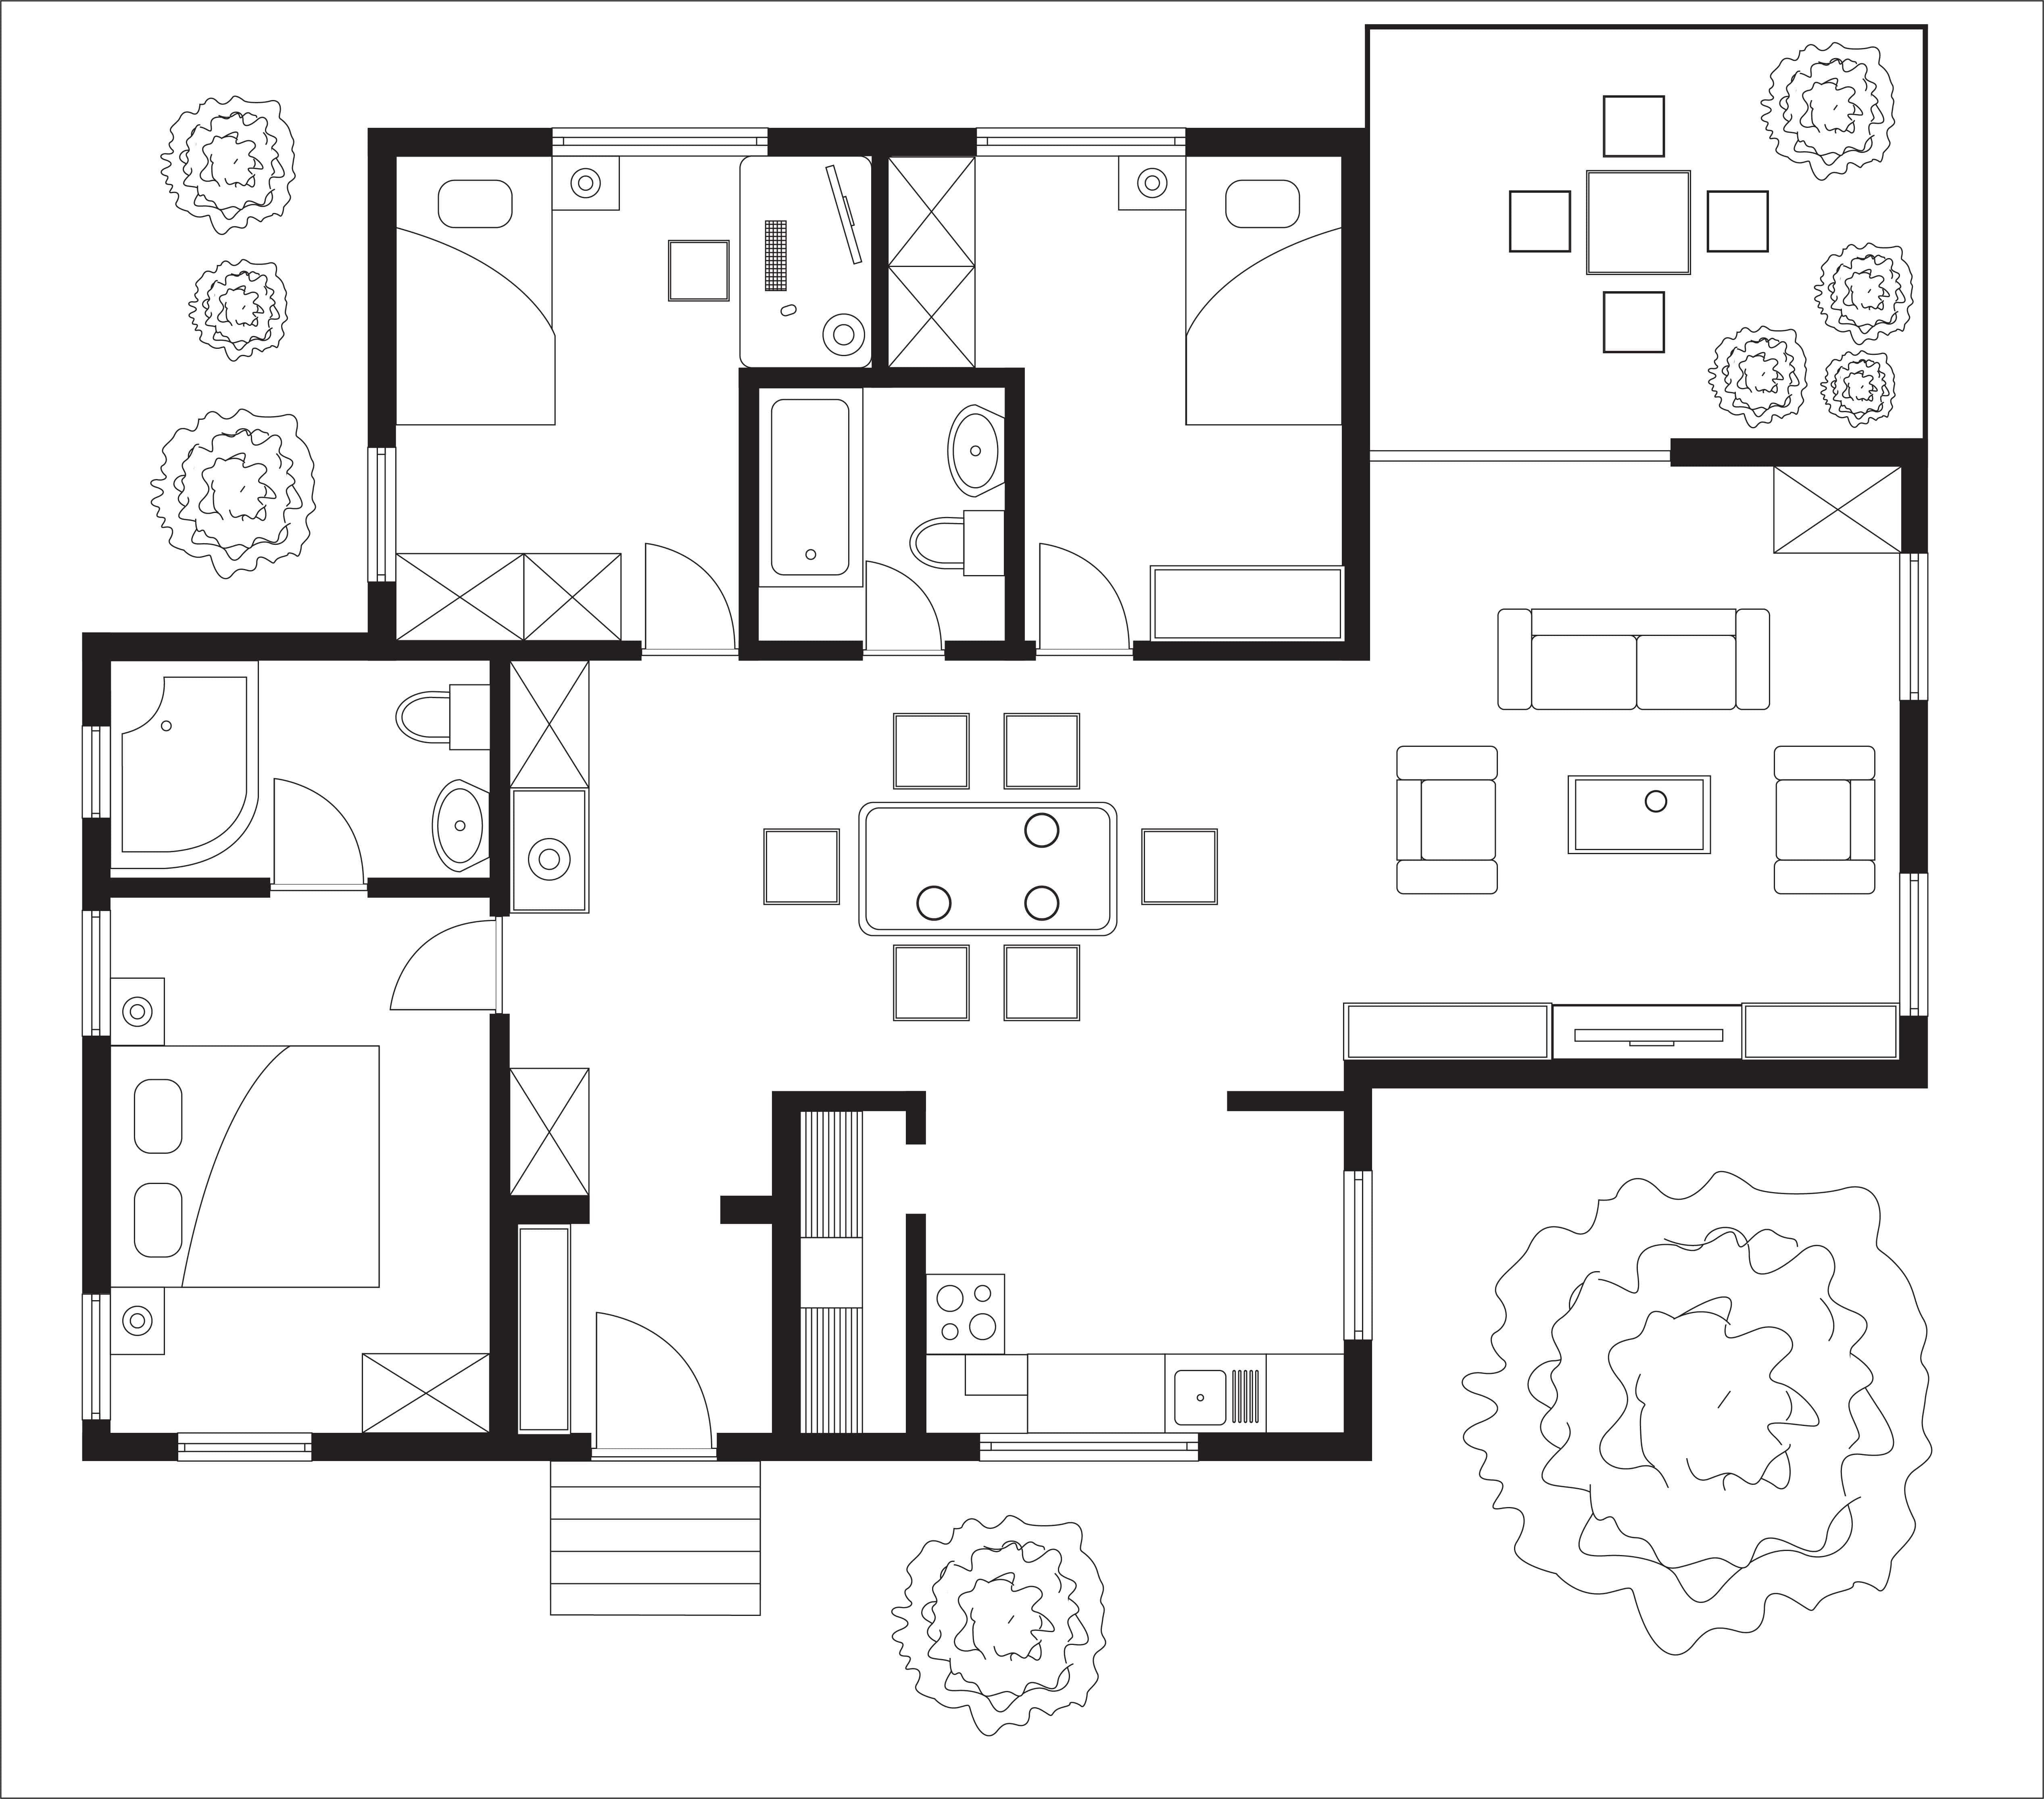 internal-floor-plan-min